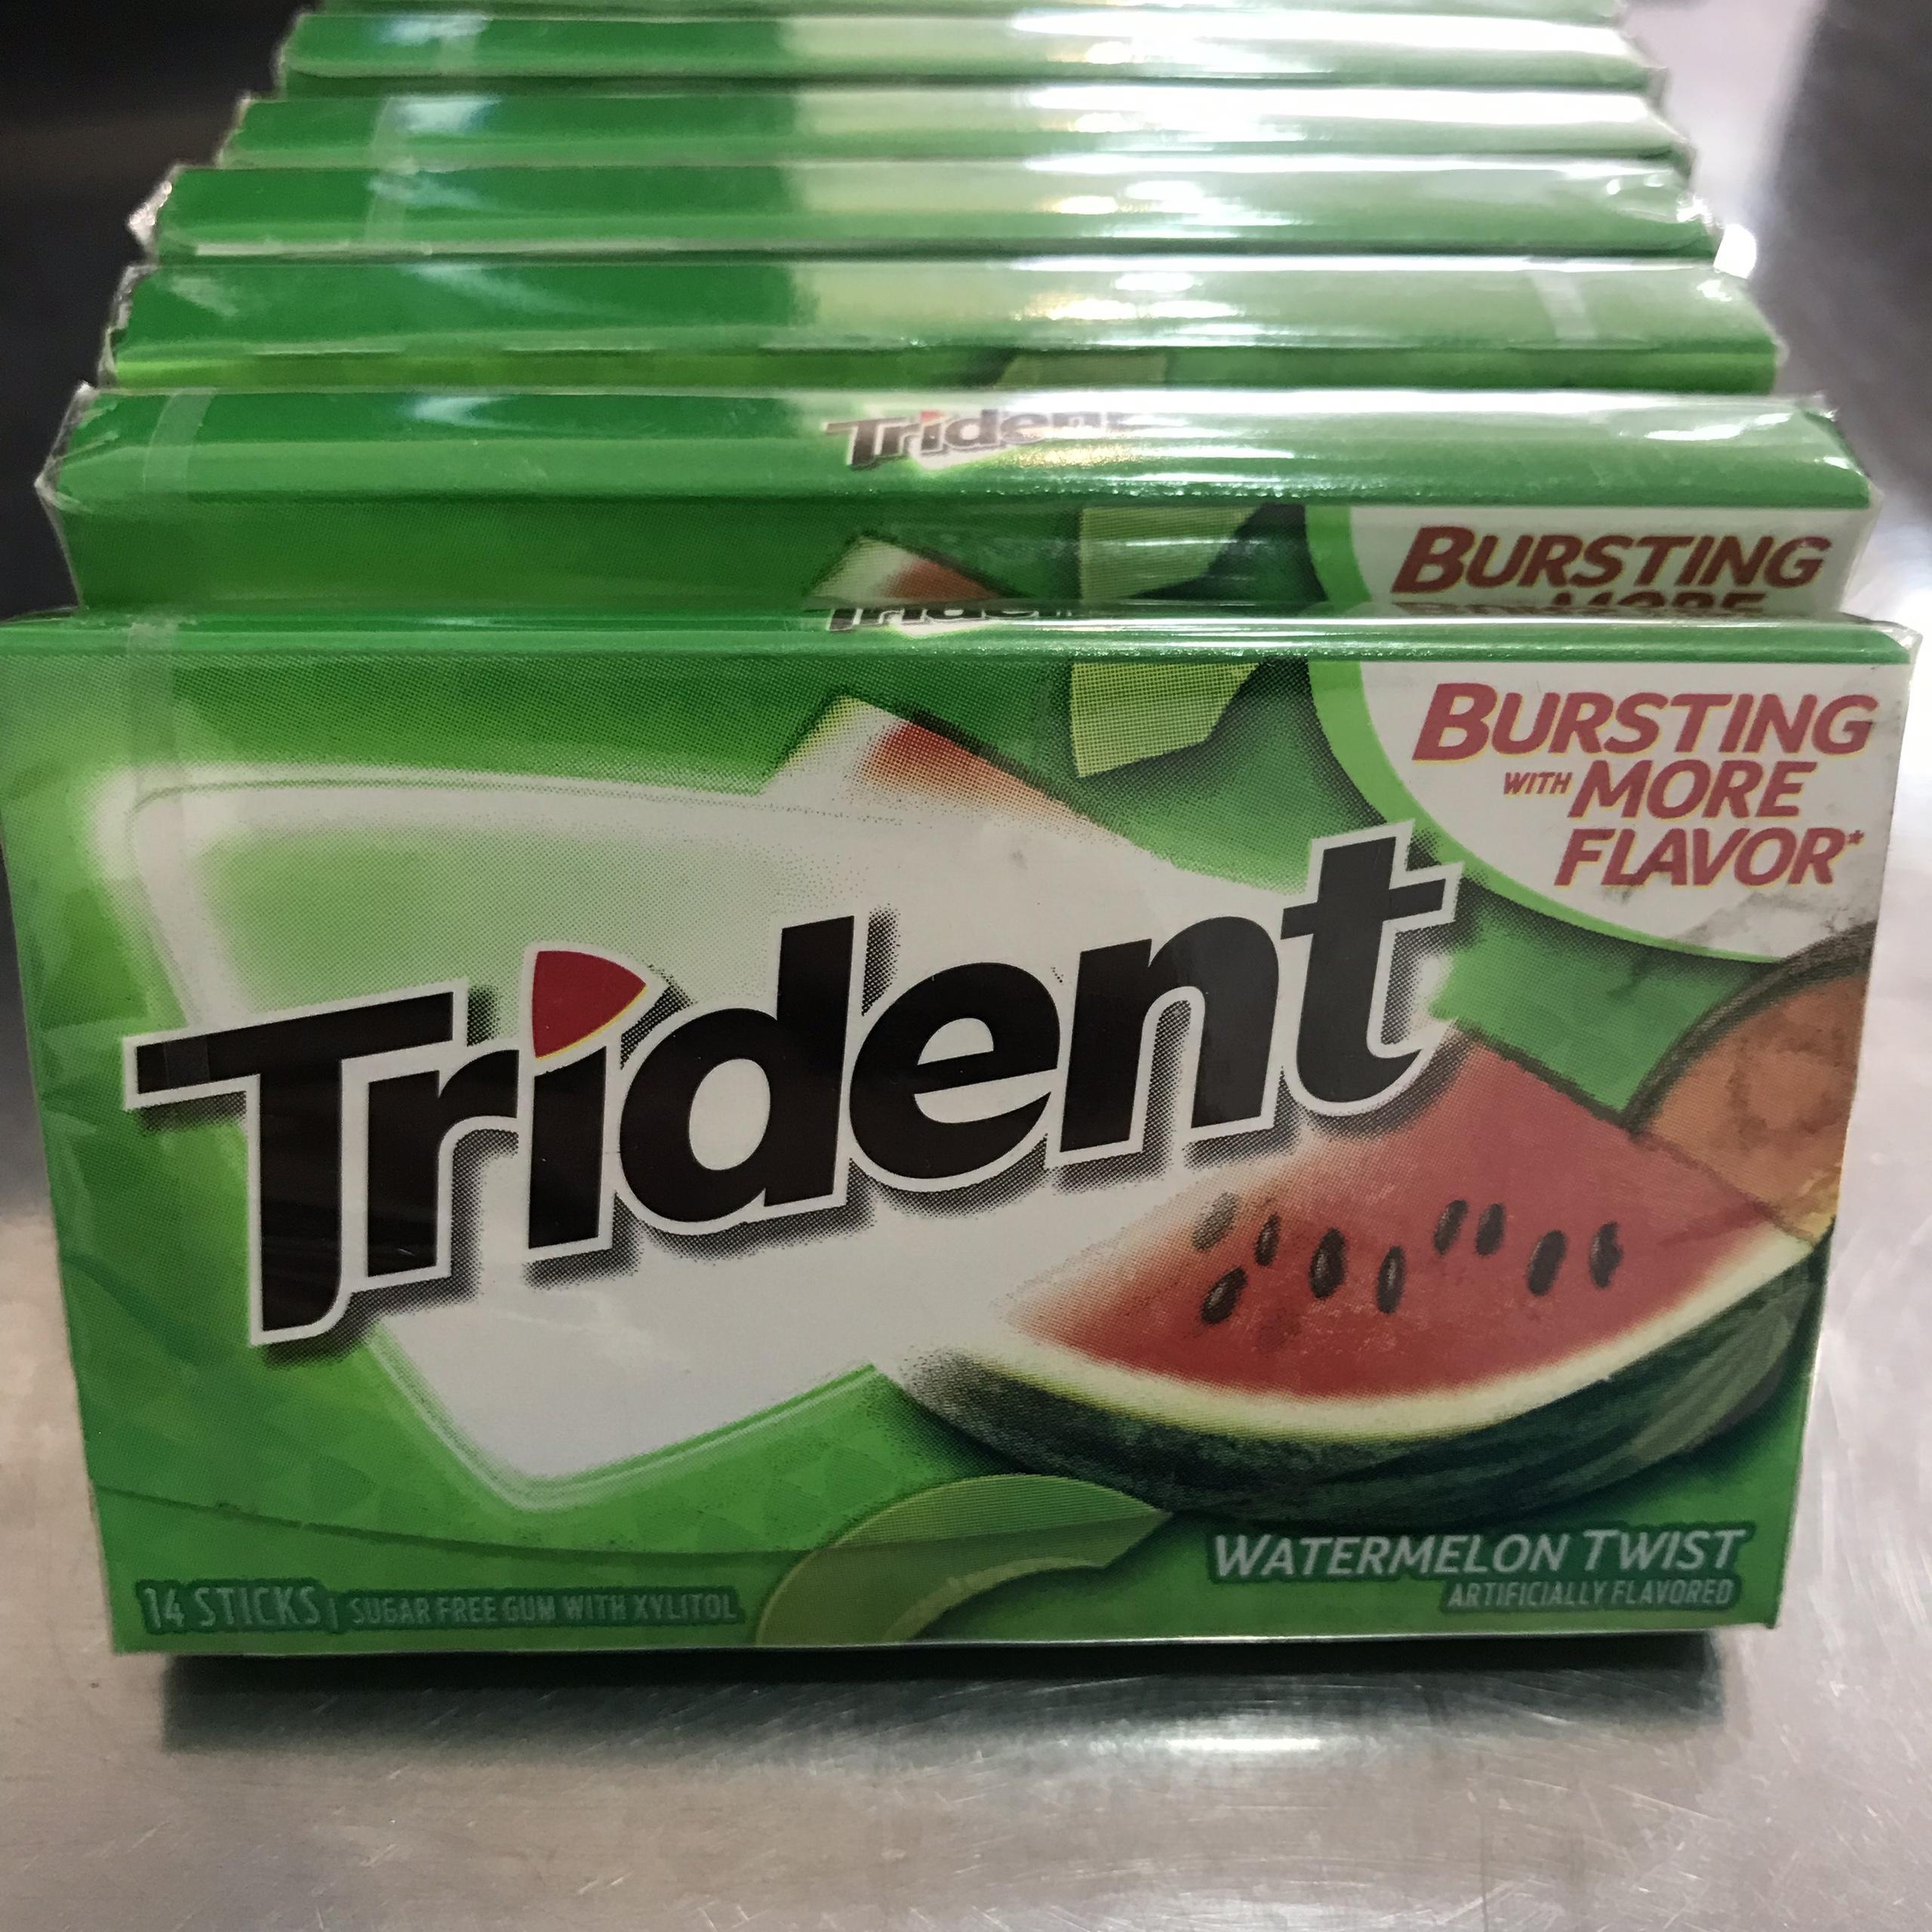 KẸO SINGUM  (Chewing gum) Trident USA - COMBO 3 HỘP X 14 STICKS